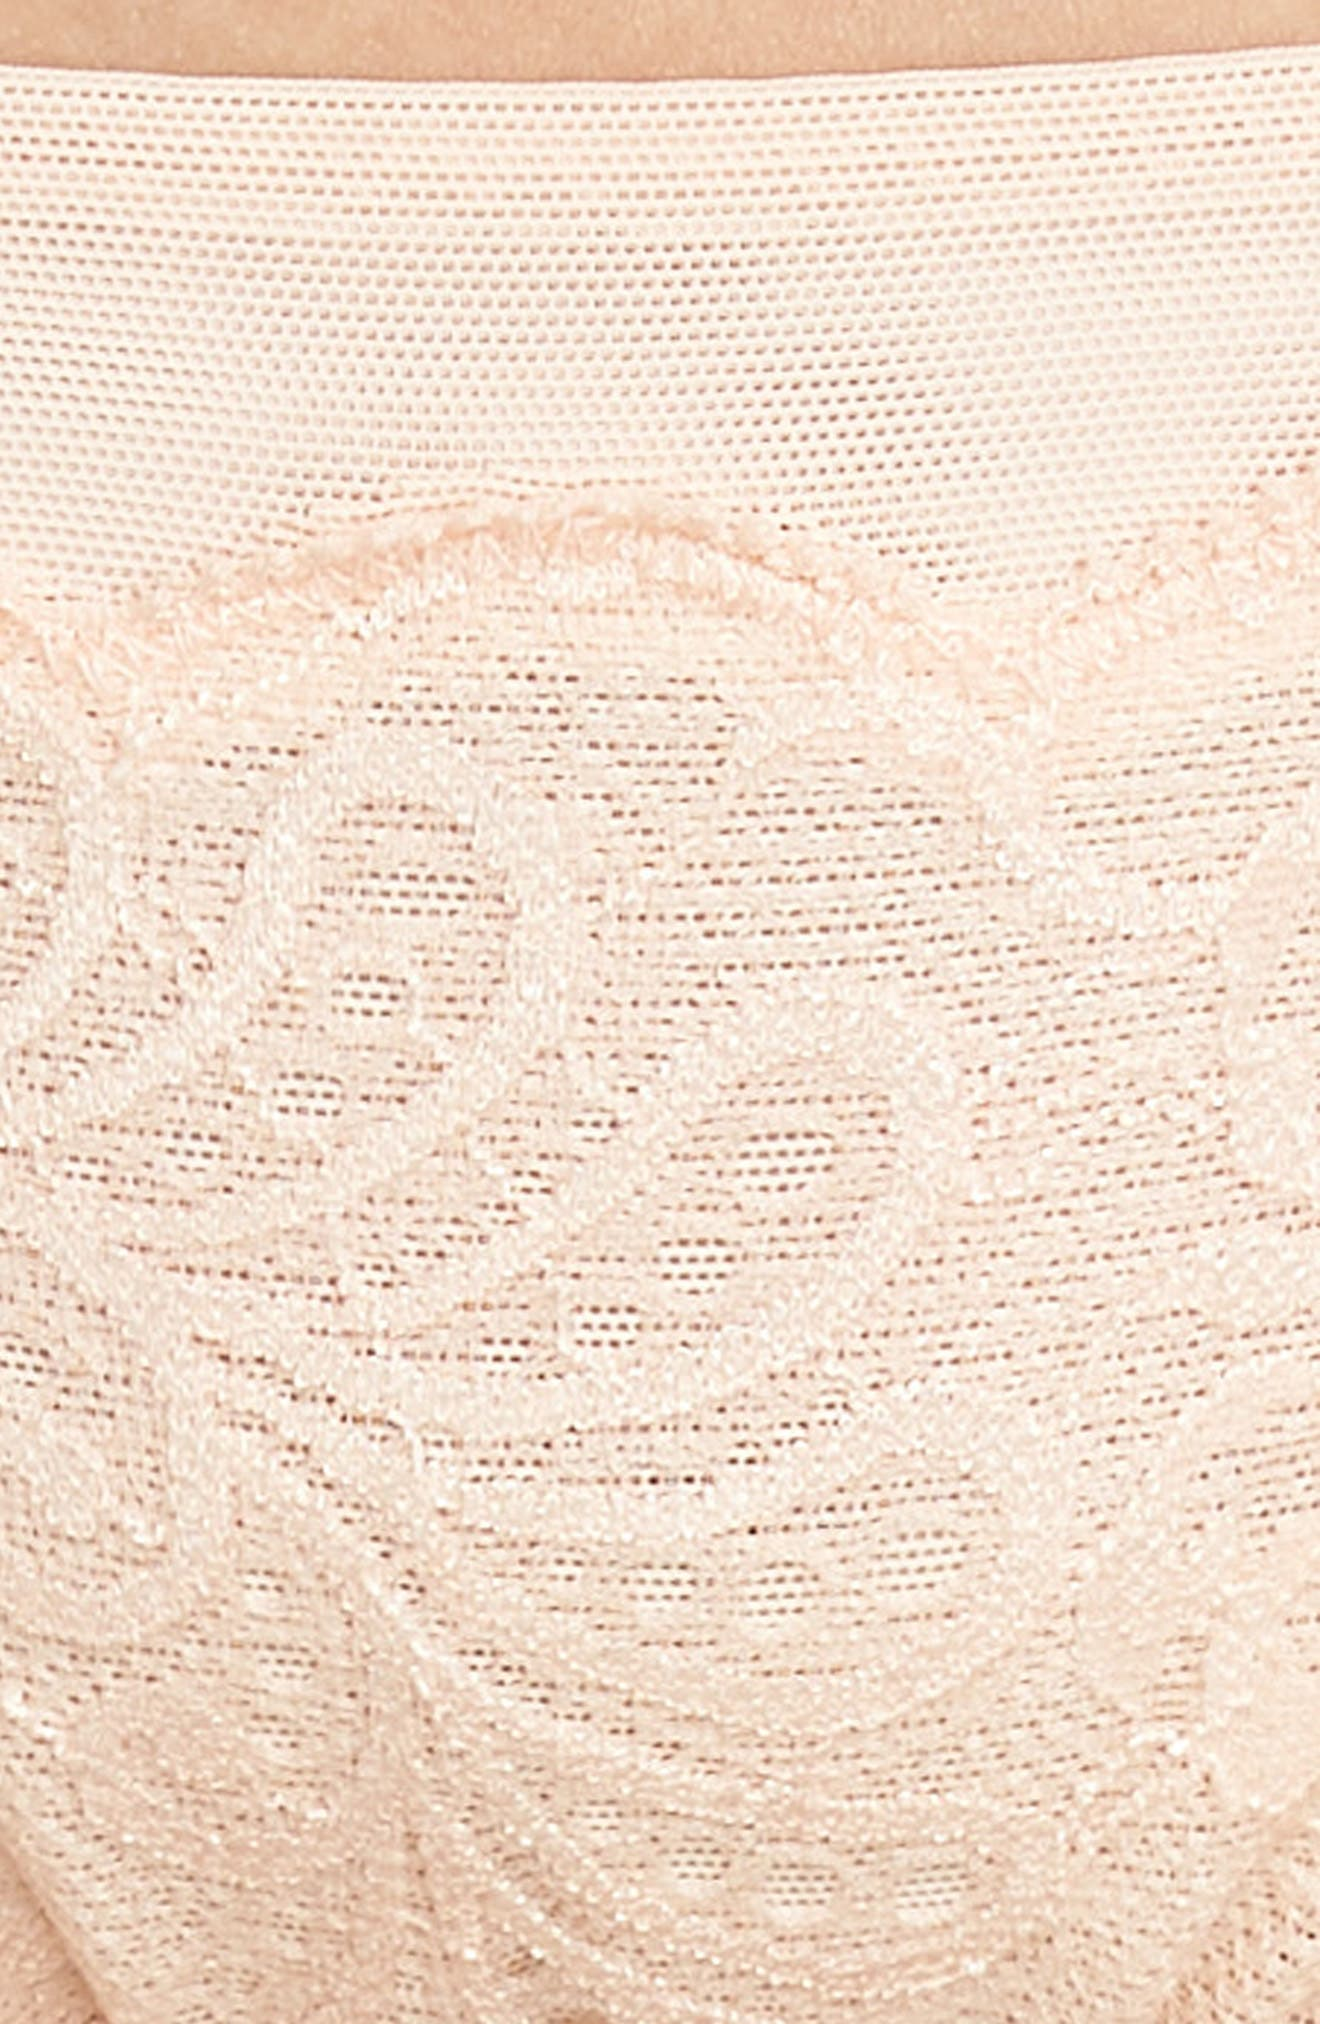 'Sophia' Lace Bikini,                             Alternate thumbnail 8, color,                             Peach Blossom